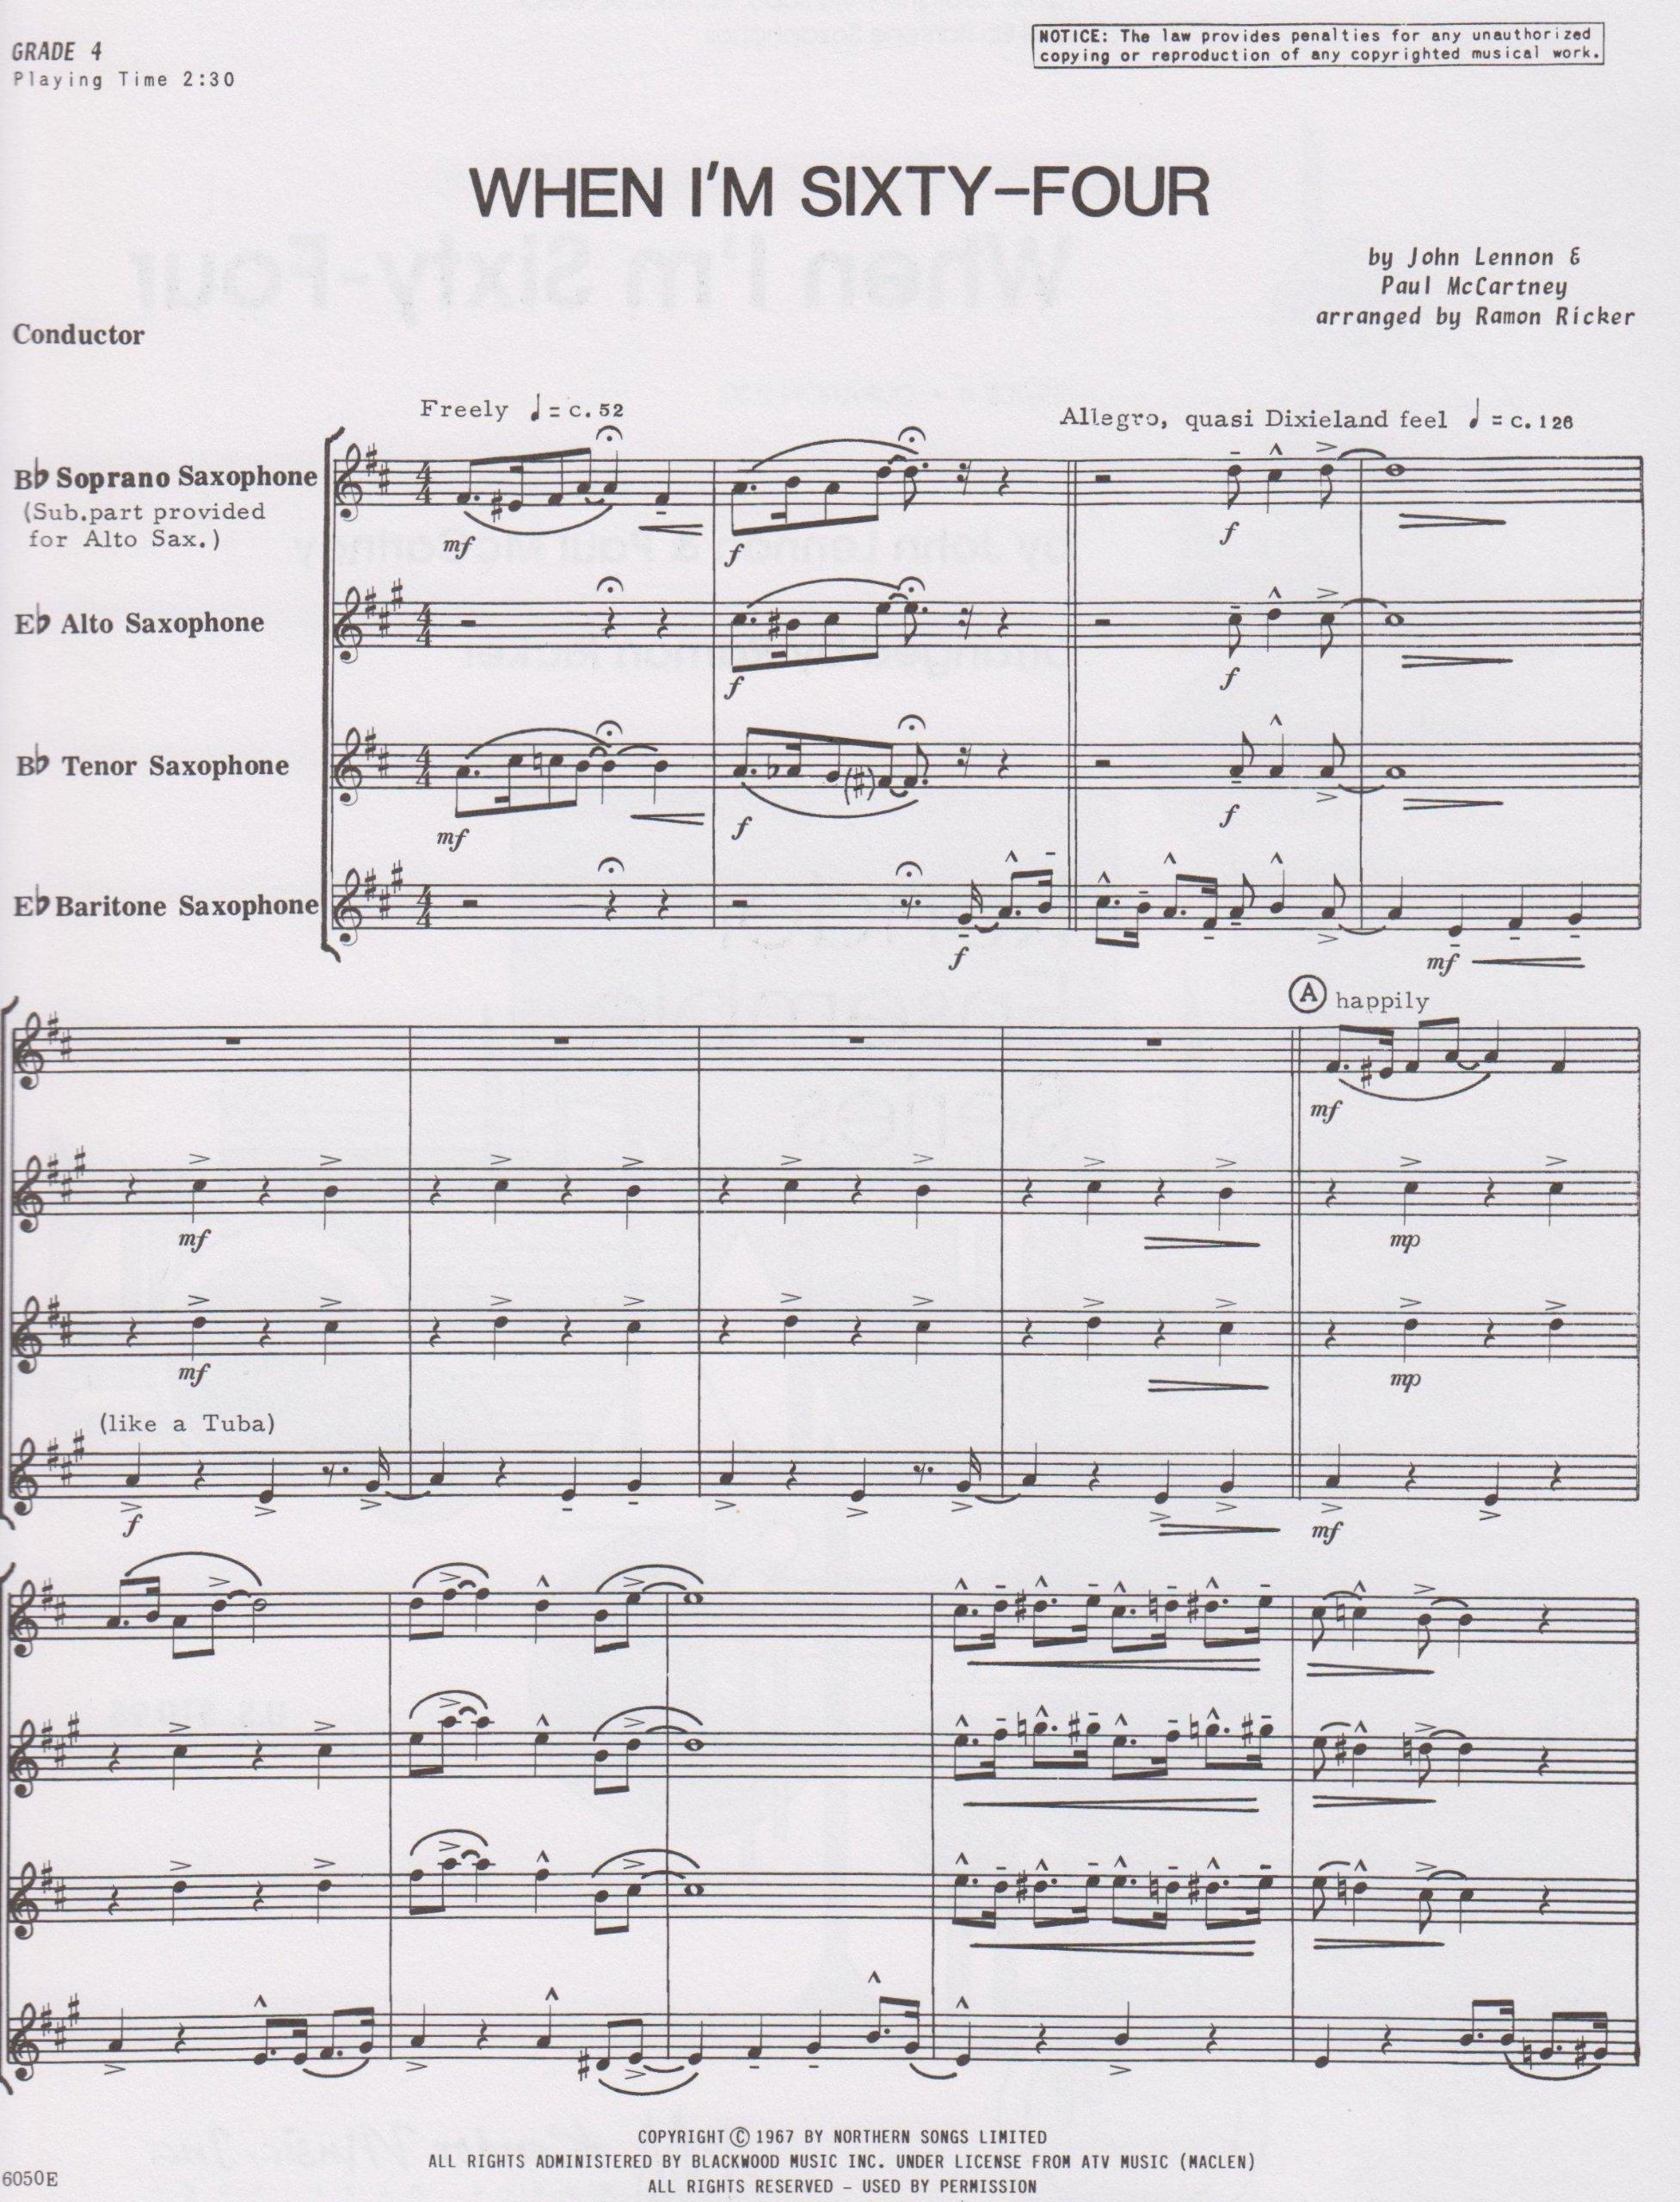 When I'm Sixty-Four for Saxophone Quartet by John Lennon